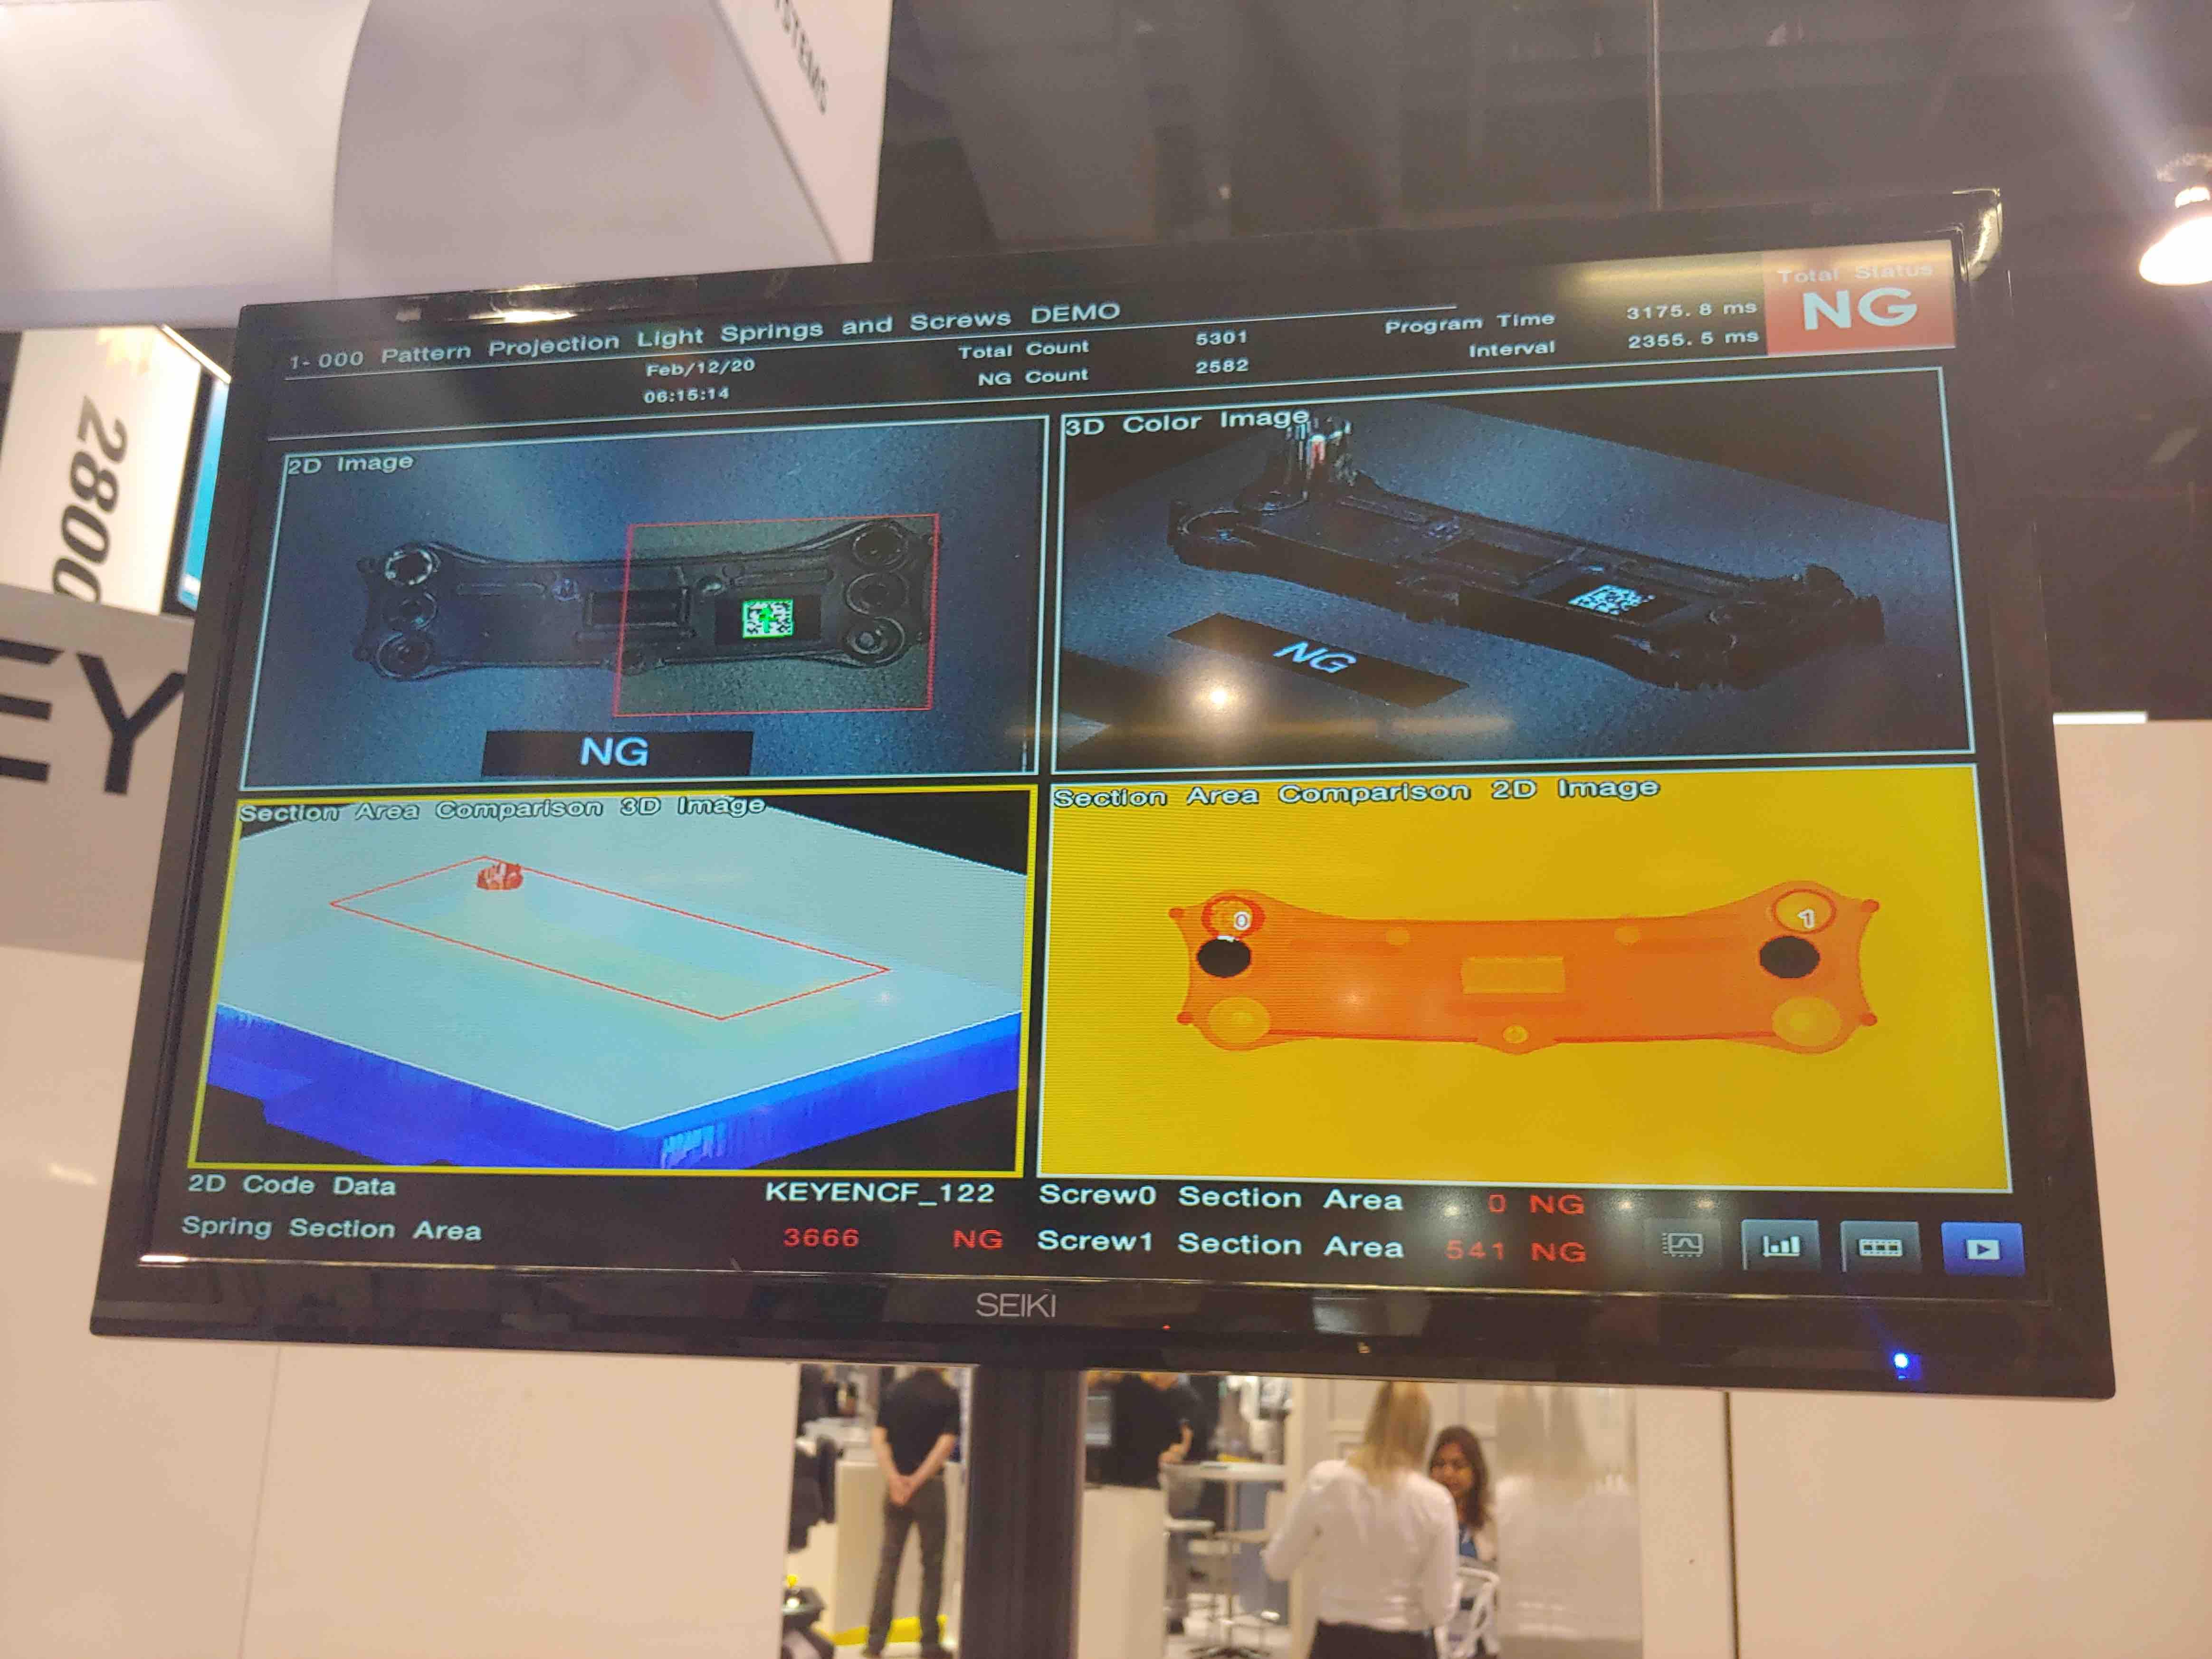 keyence vision systems on display